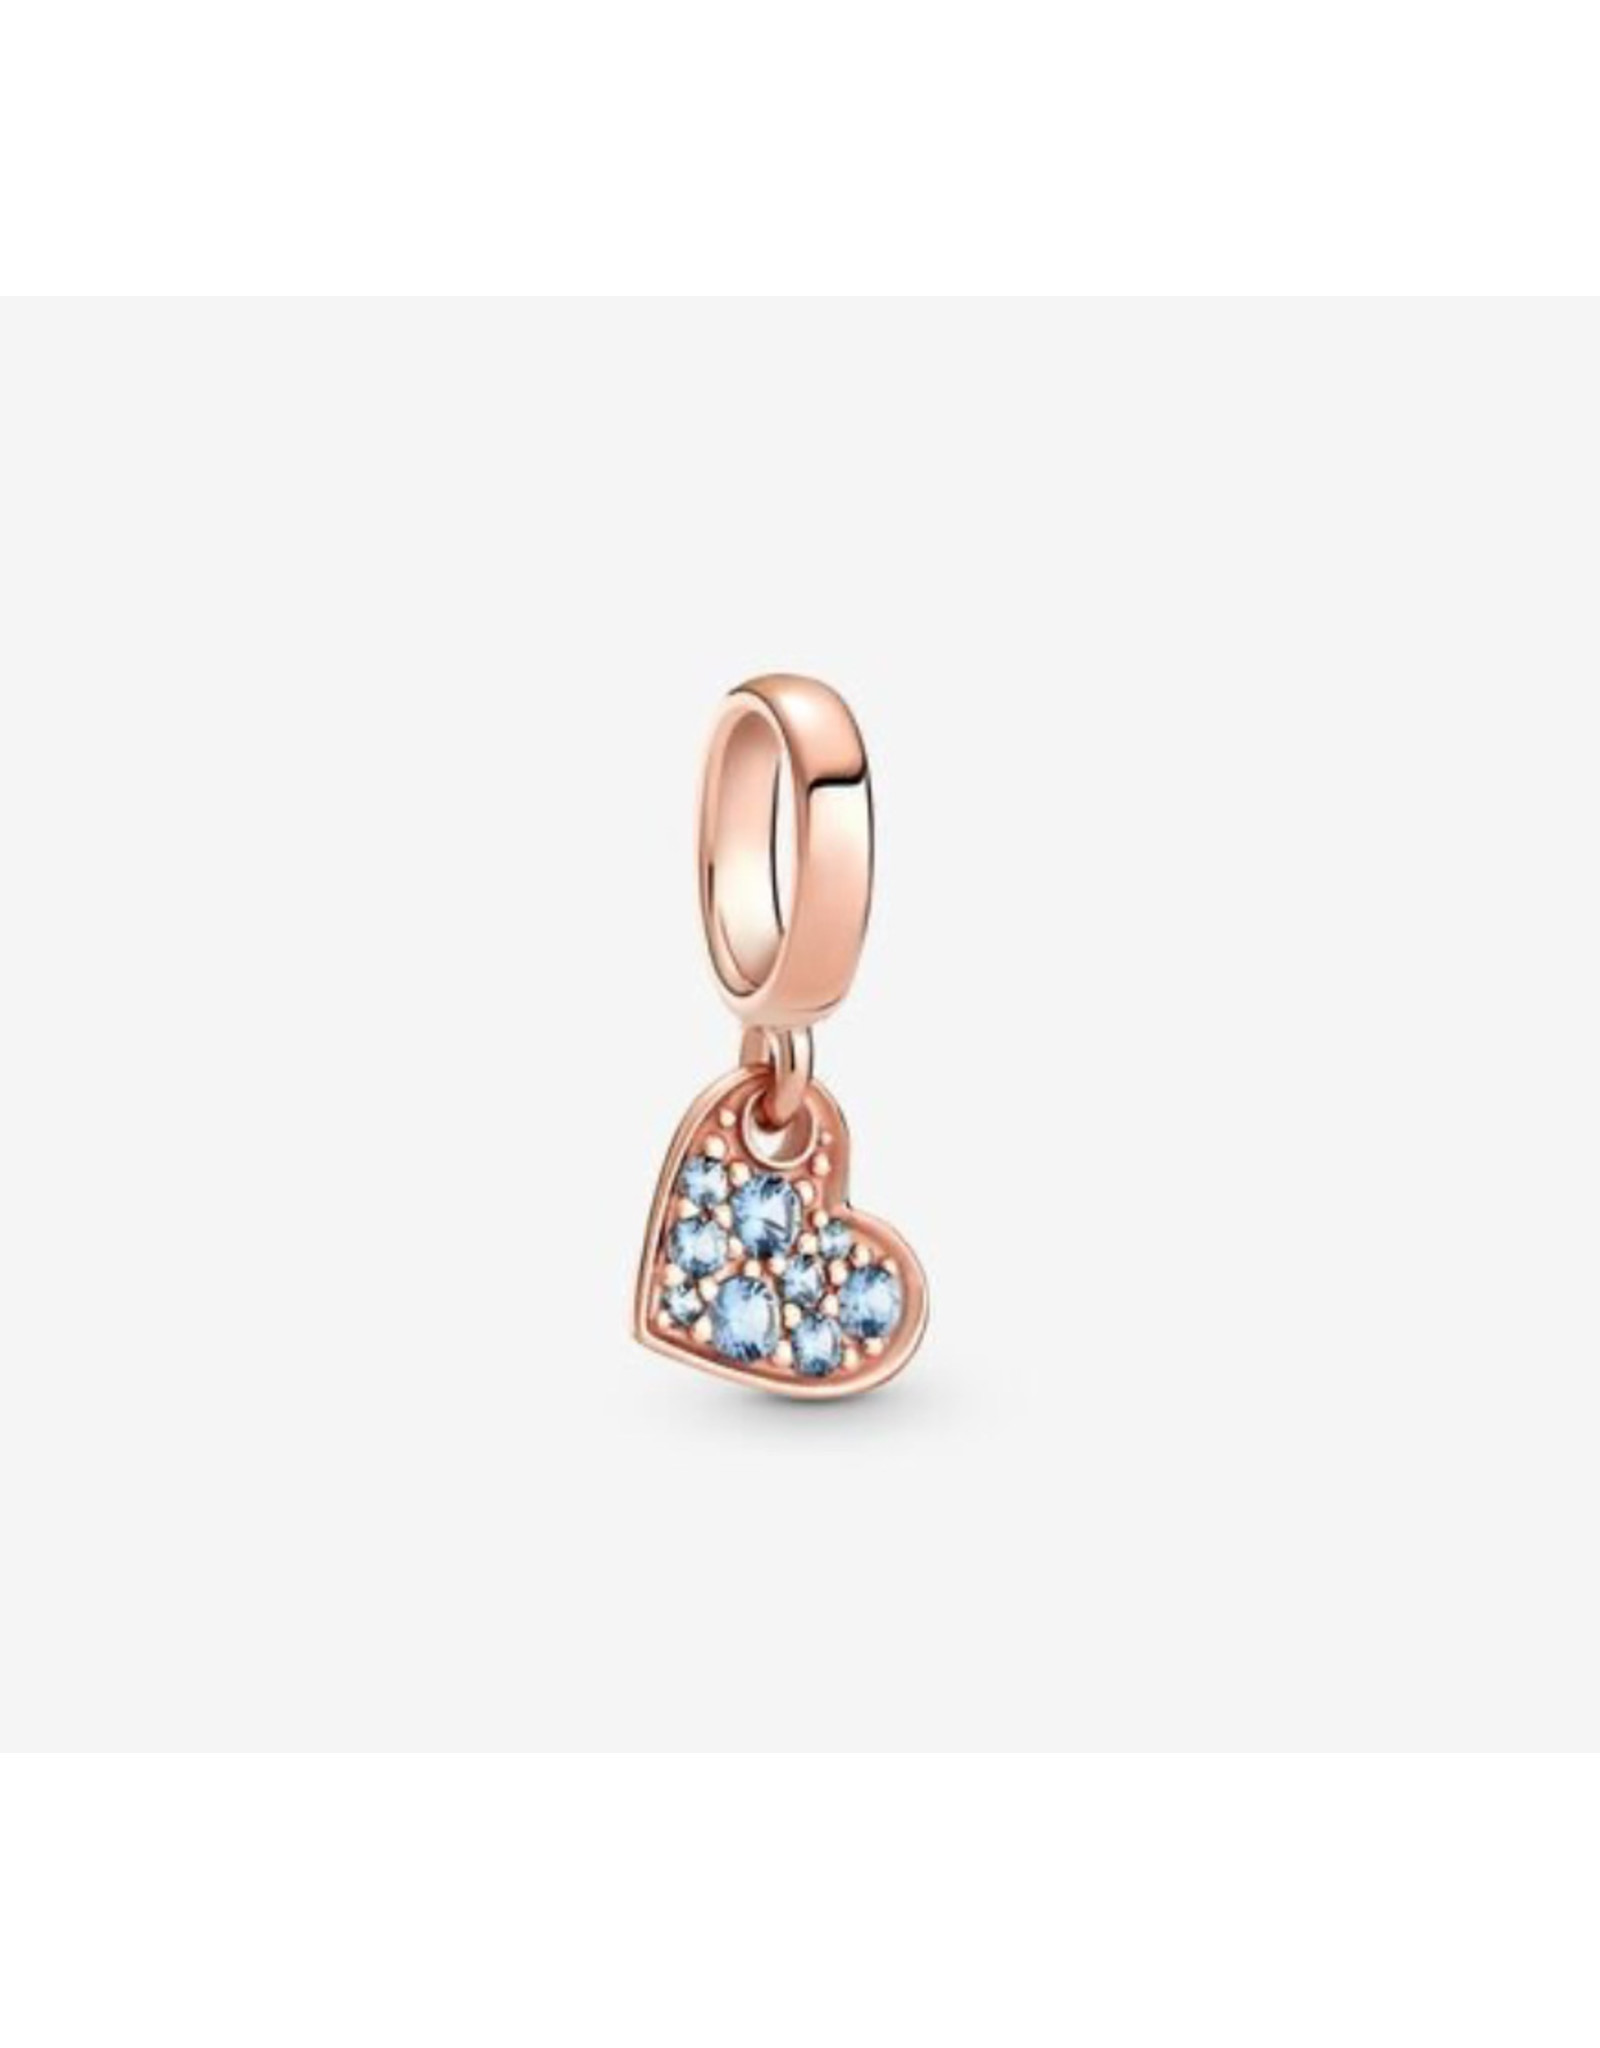 Pandora Pandora Charm,789404C01, Pave Tilted Heart Dangle, Blue Crystals, Rose Gold